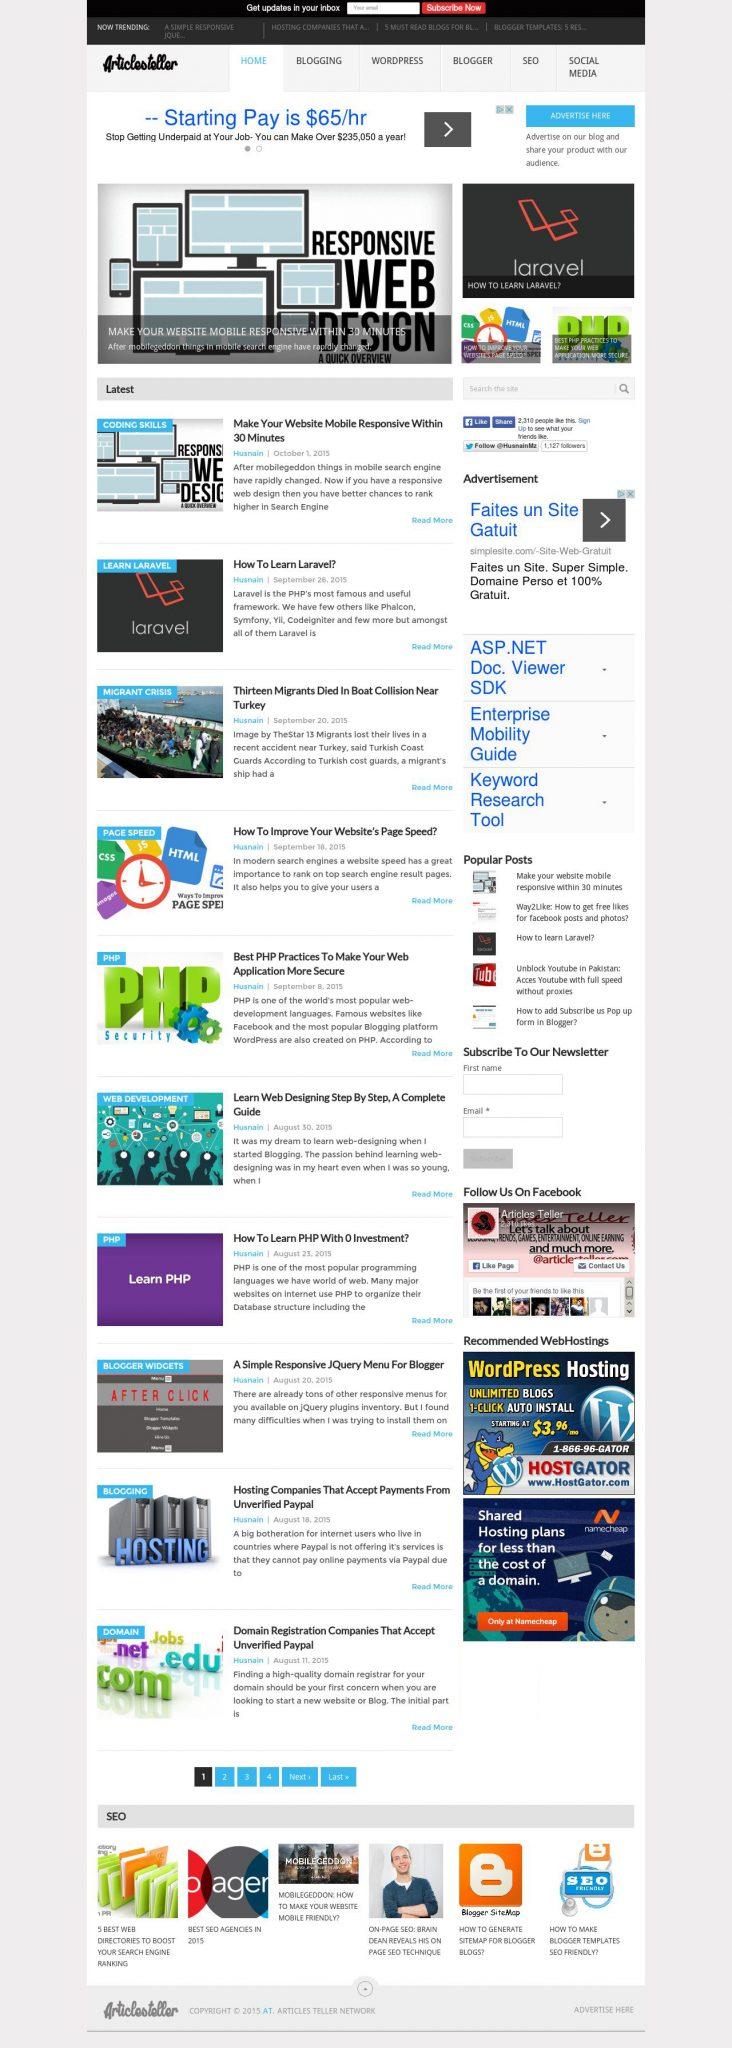 Articles Teller